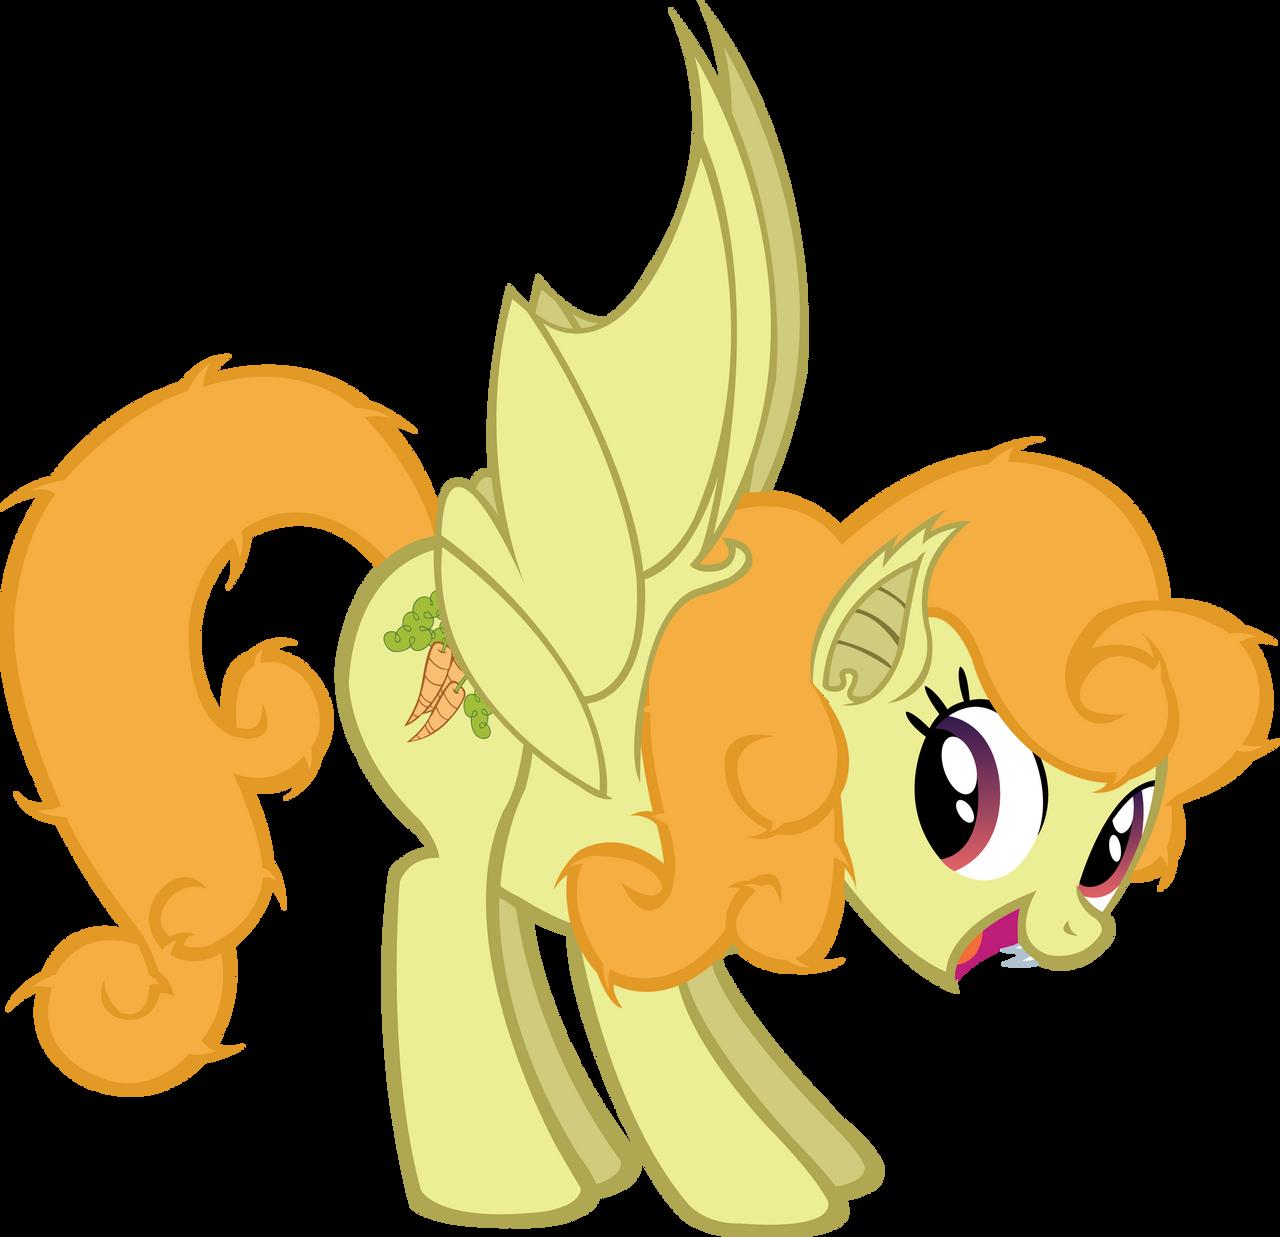 carrot_top_bat_by_fluttershy750-d7fouhq.png (1280×1237)